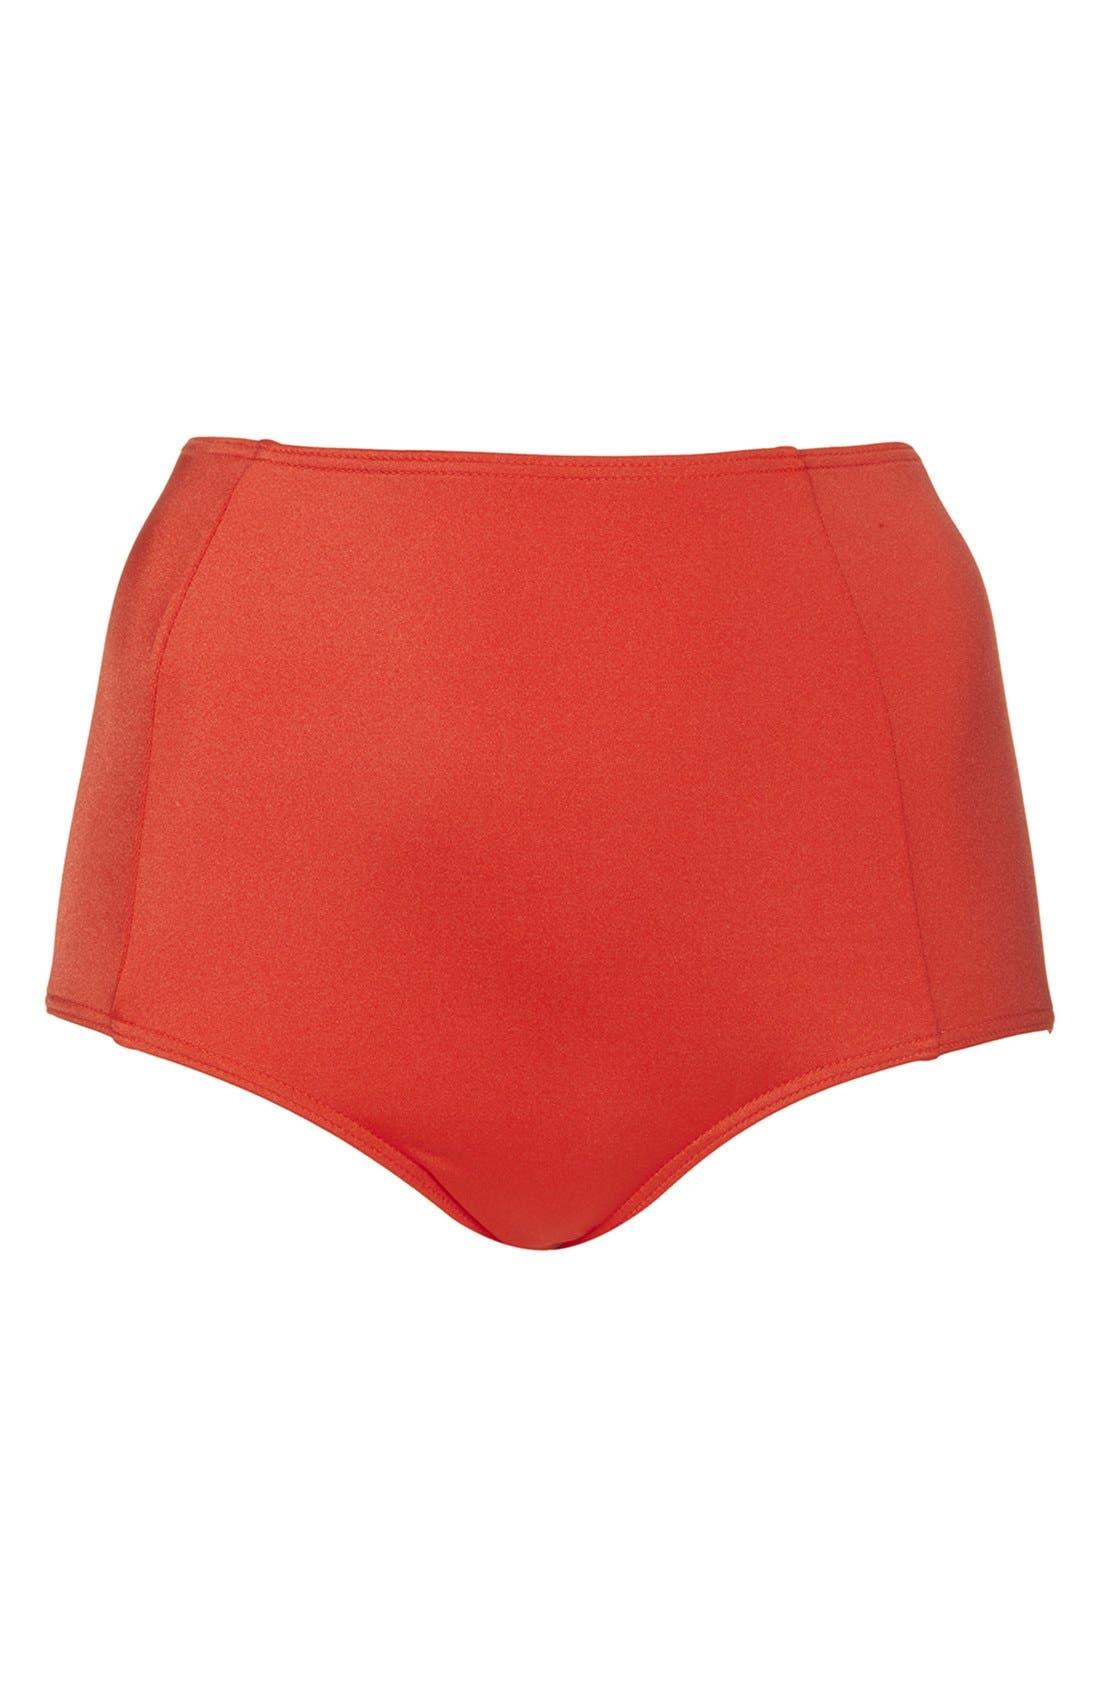 Alternate Image 1 Selected - Topshop High Rise Bikini Bottoms